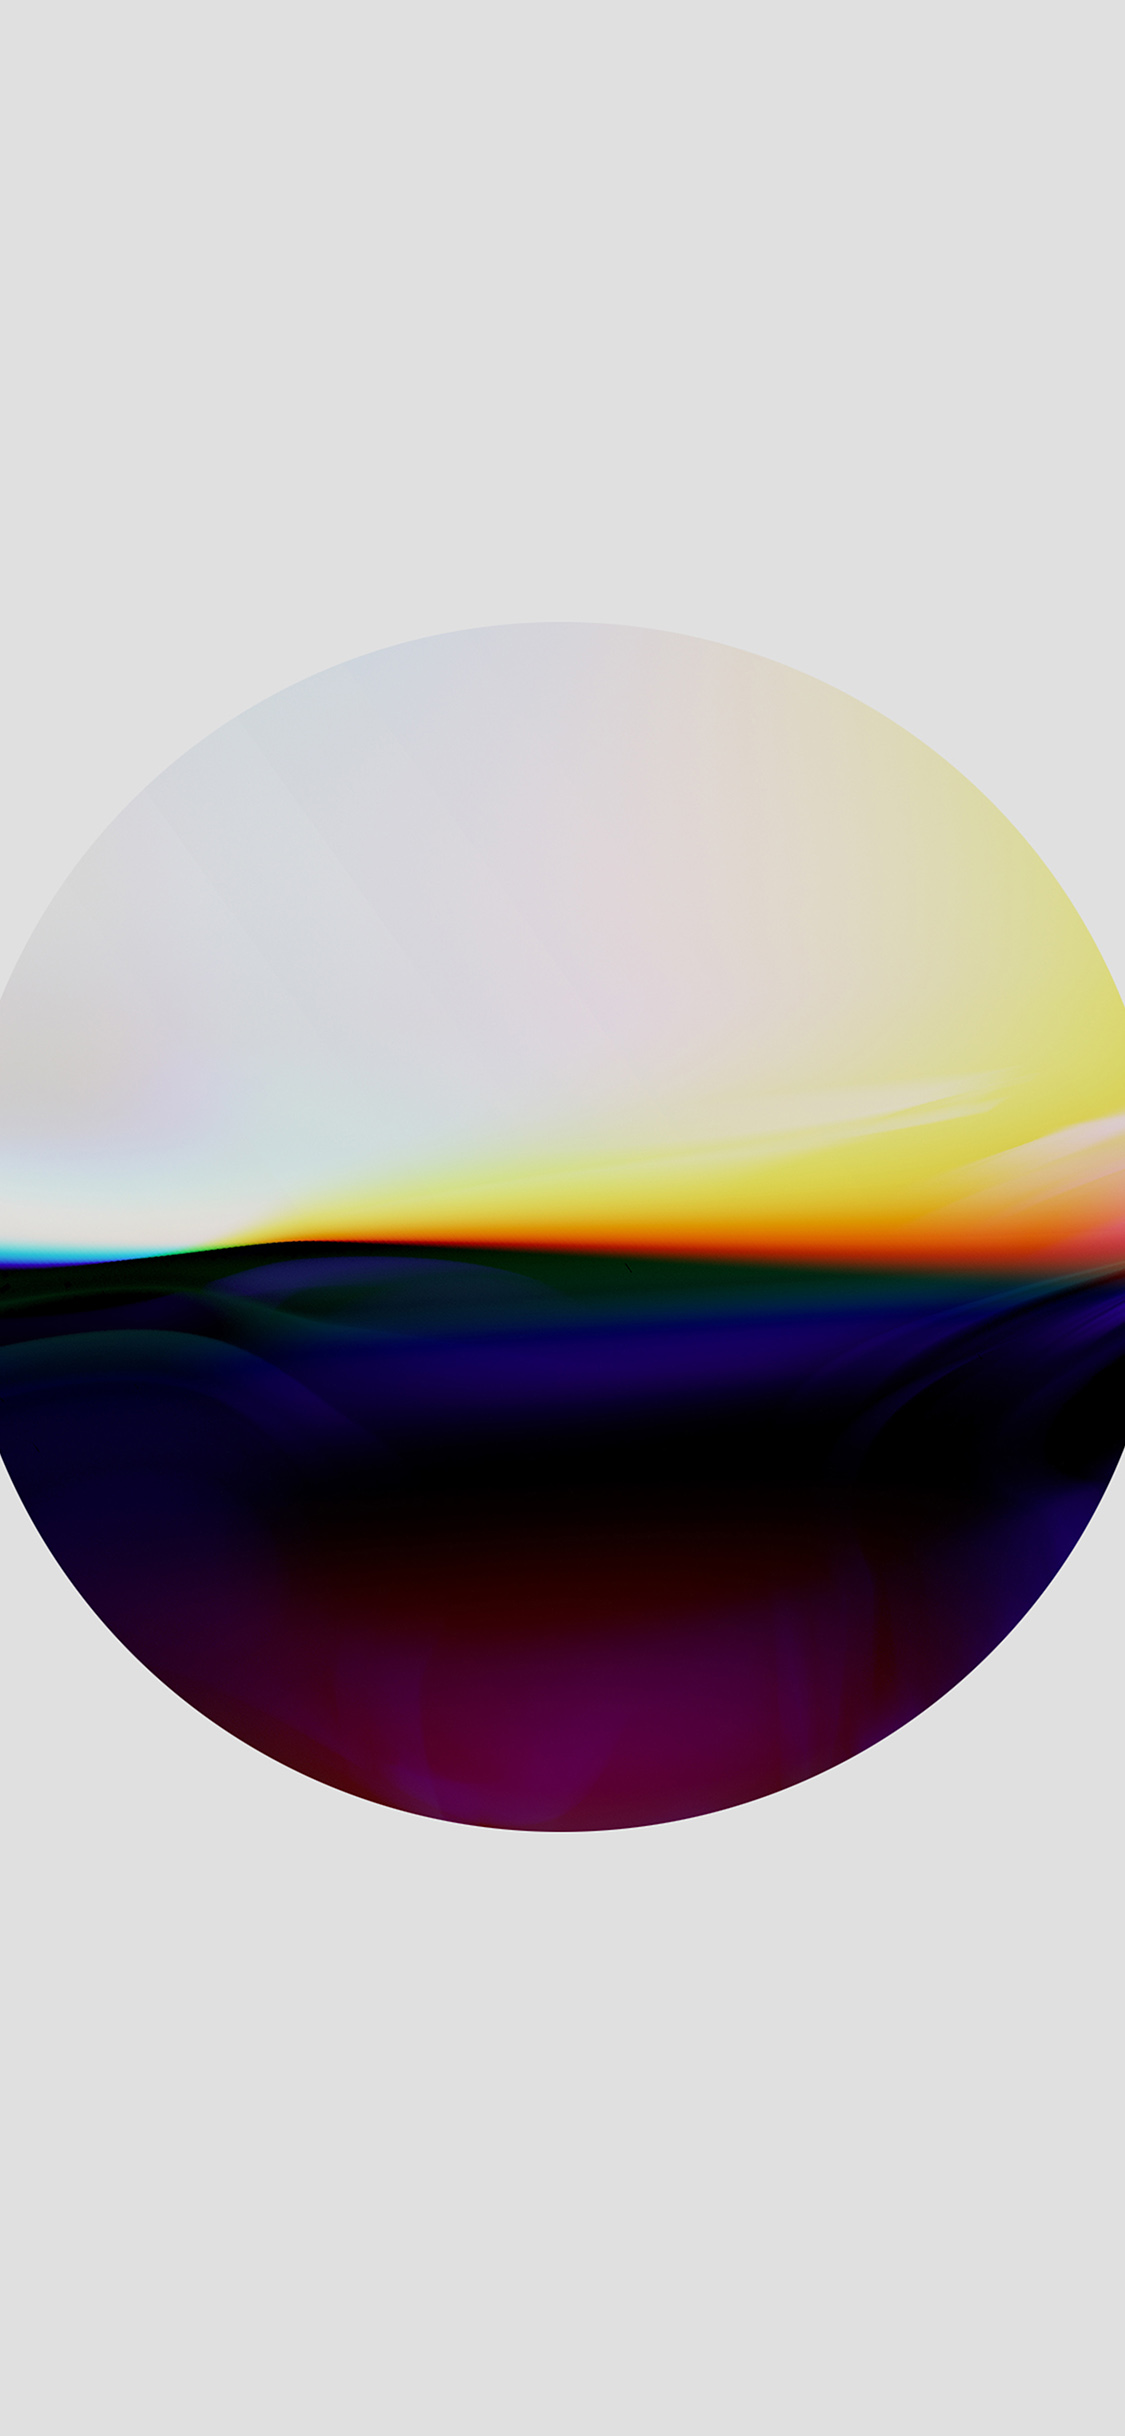 iPhoneXpapers.com-Apple-iPhone-wallpaper-bb46-circle-rainbow-minimal-illustration-art